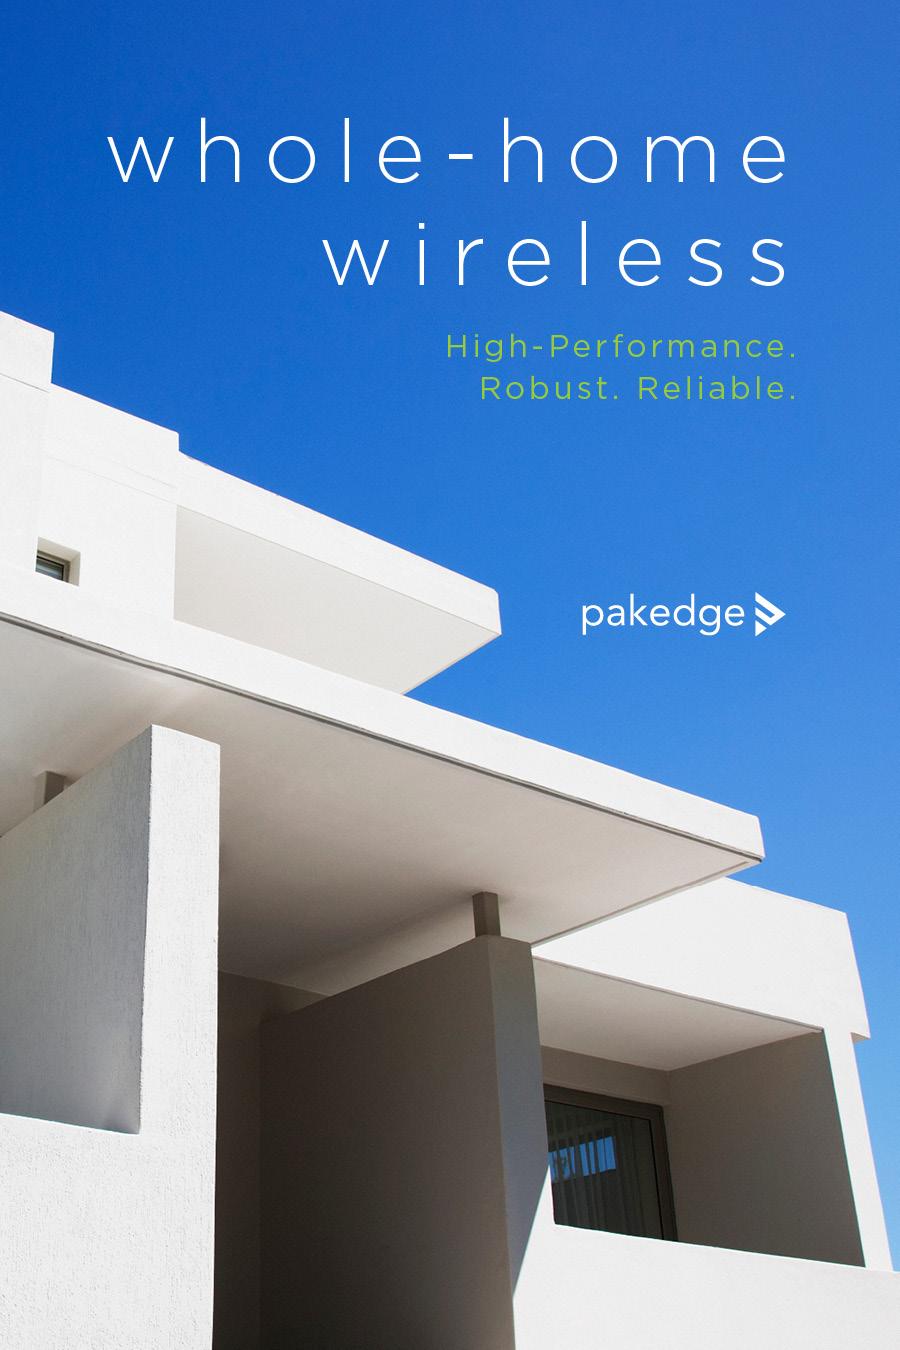 Pakedge - Whole Home Wireless